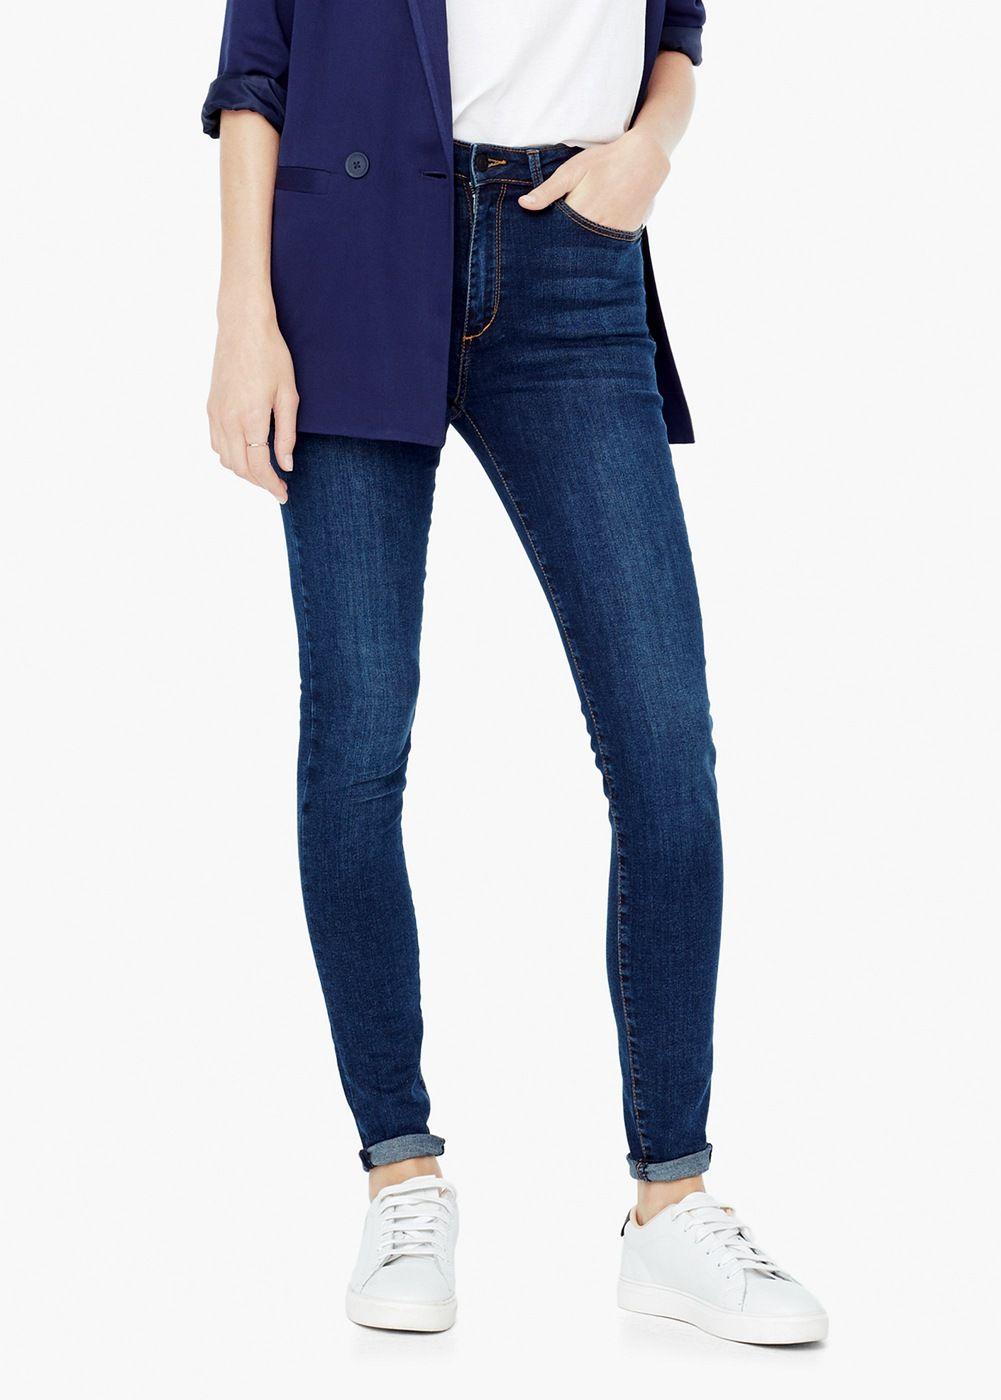 Dżinsy high waist  highwaisted  jeans  women s  fashion  denim  musthave b832dfc465abc